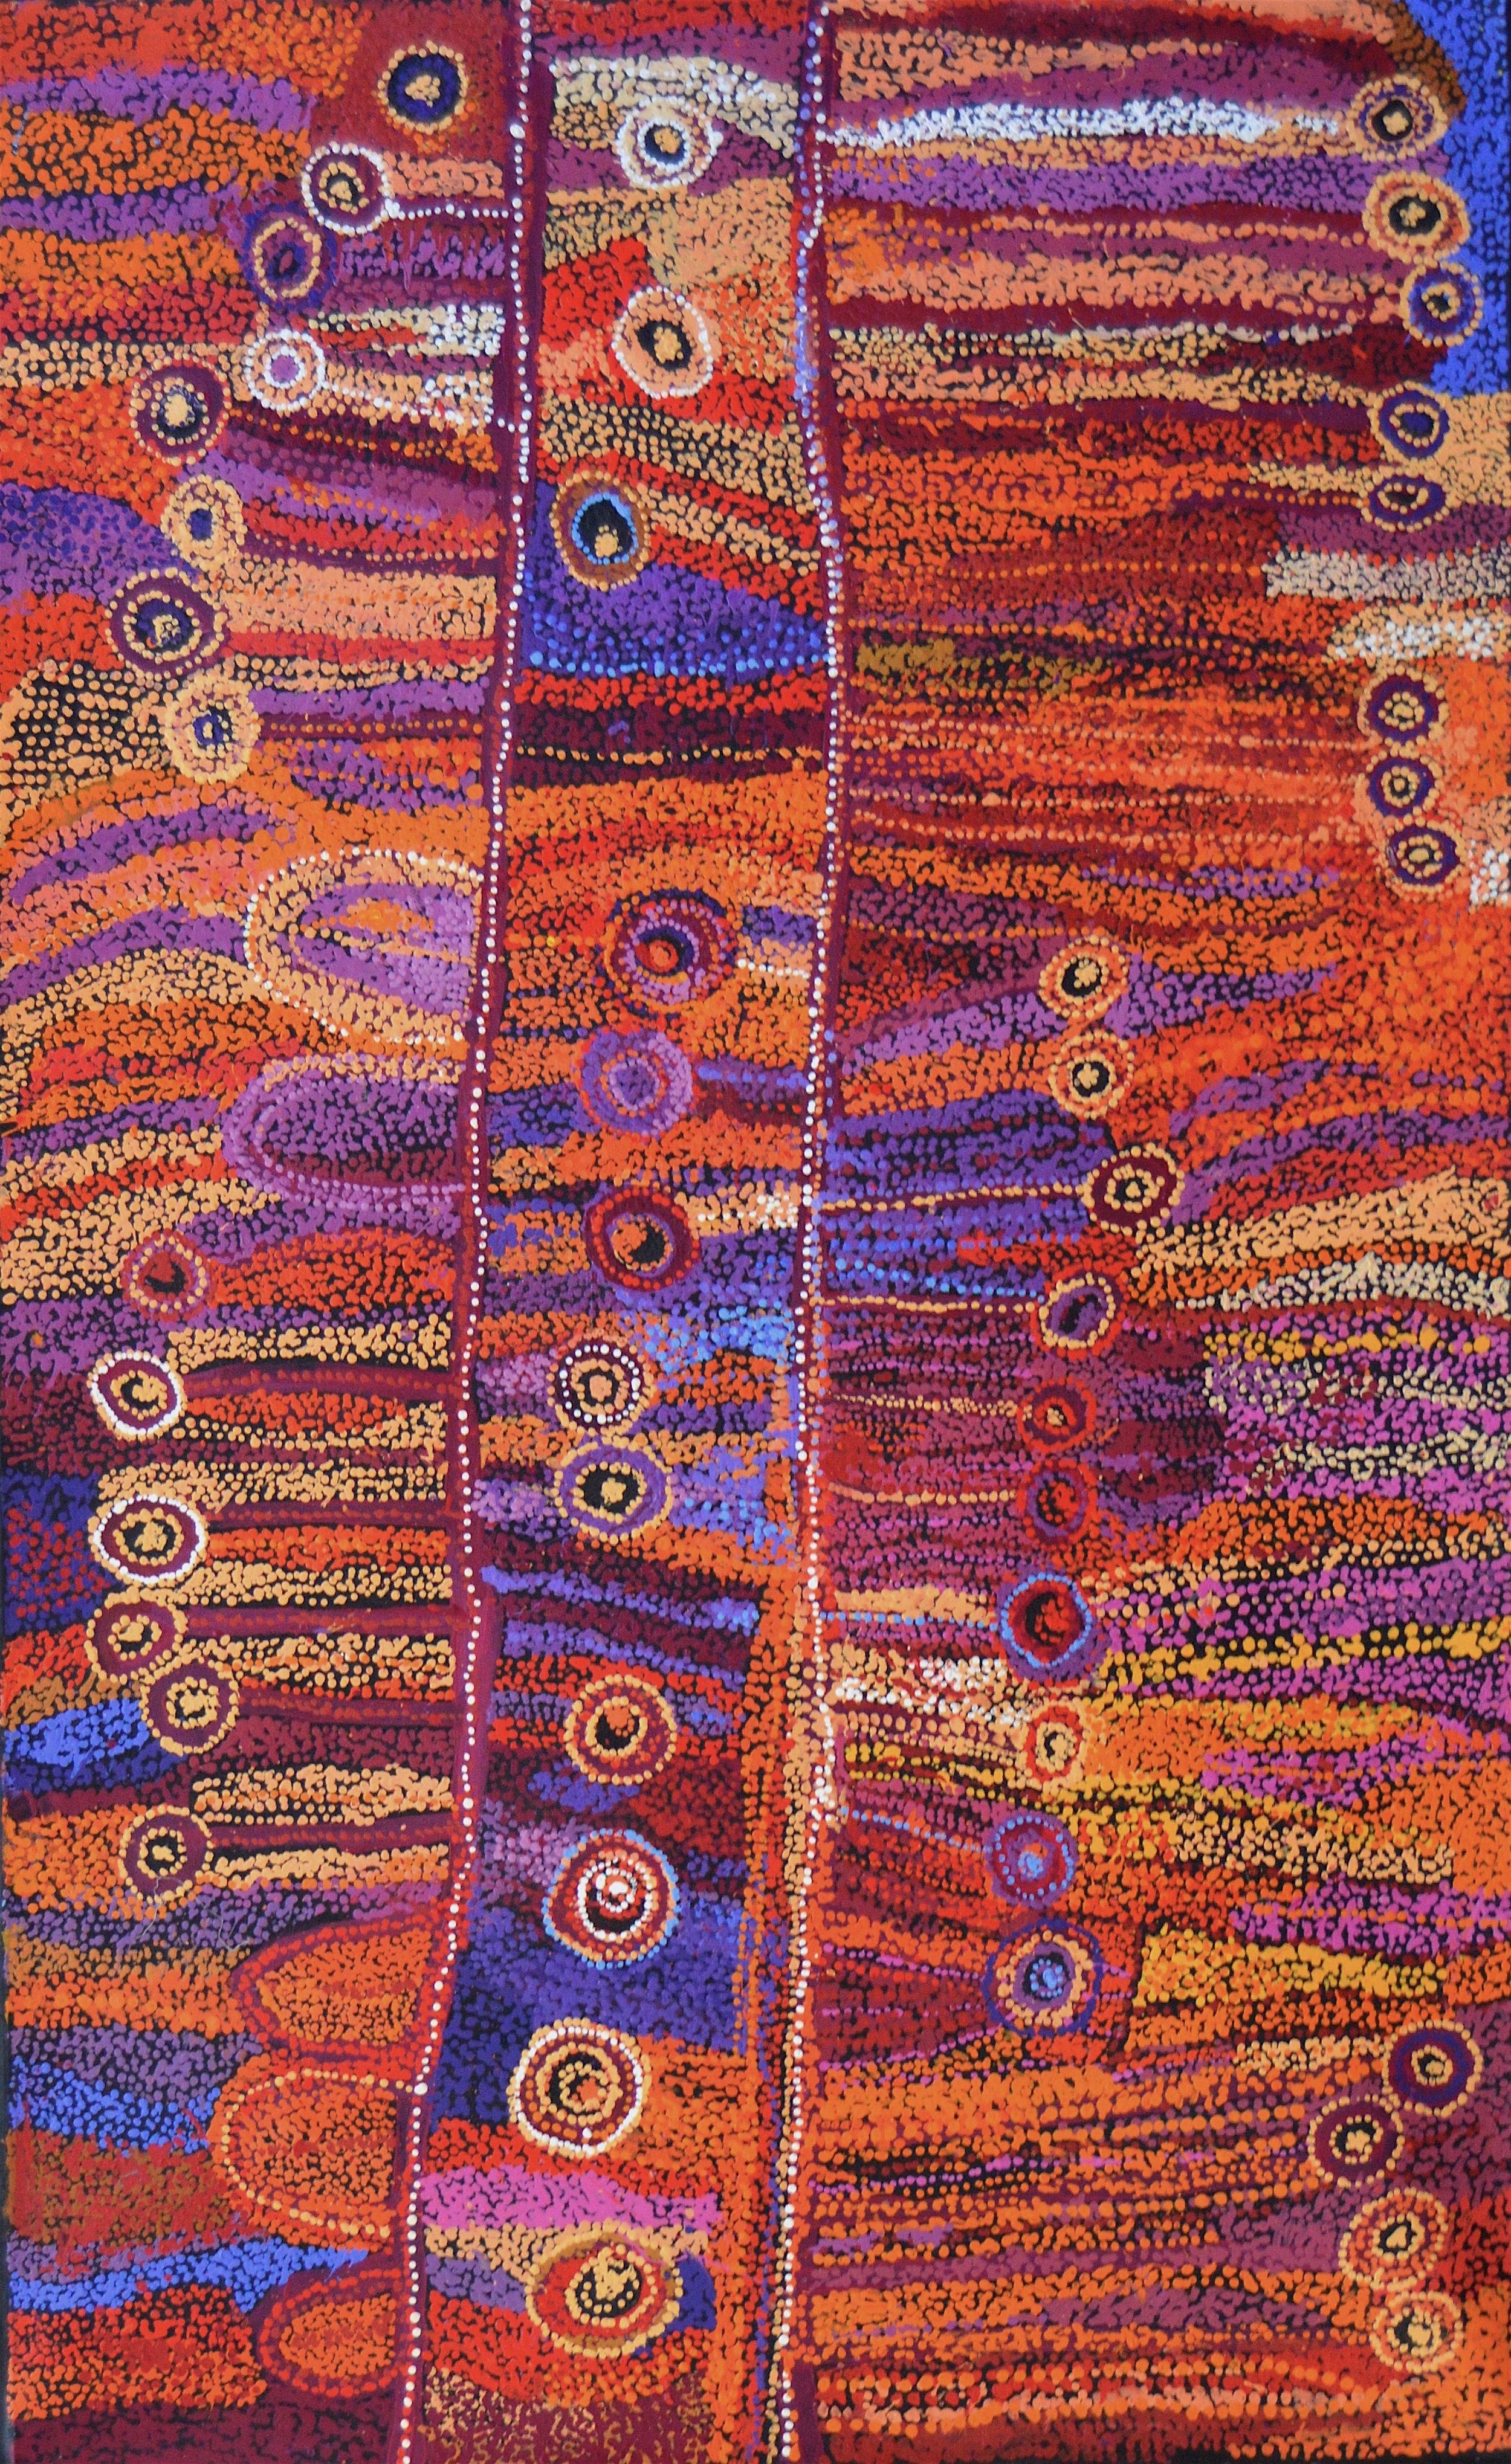 "Wawiriya Burton  Ngayuku ngura- My Country  Acrylic on Belgian linen 1525 x 1980 mm (60 x 78"") Tjala Arts Catalog #485-15   EMAIL INQUIRY"